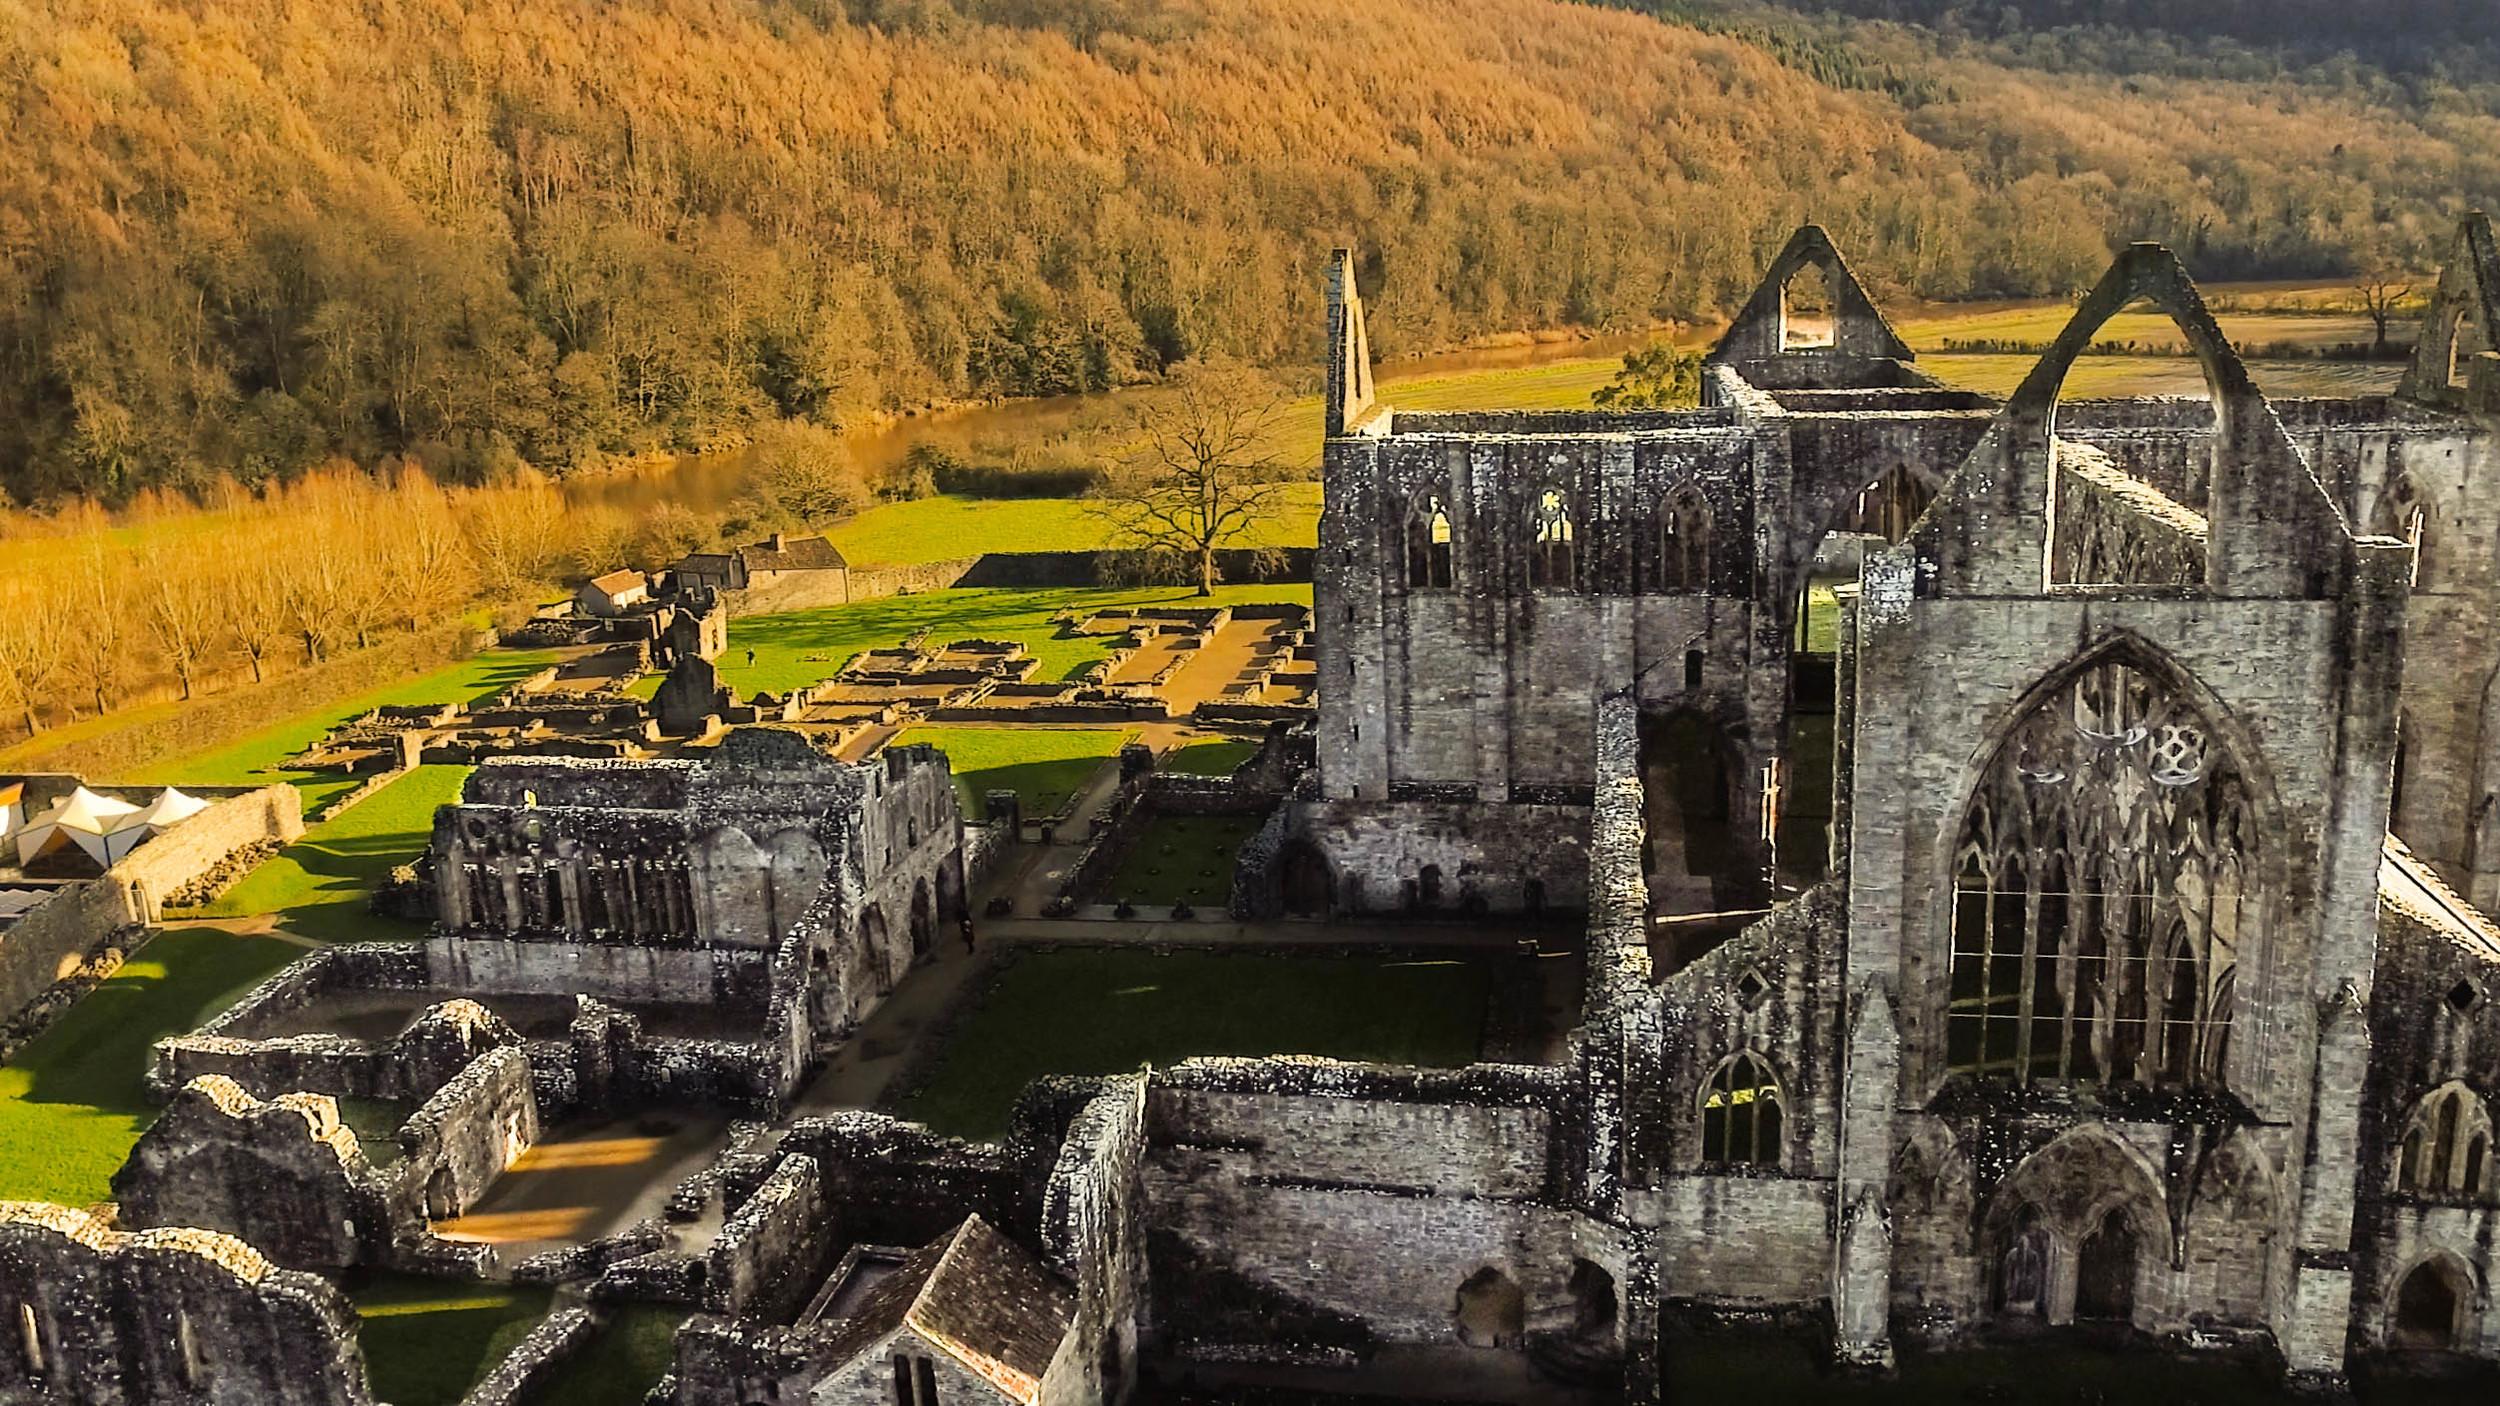 tintnern abbey 2.jpg